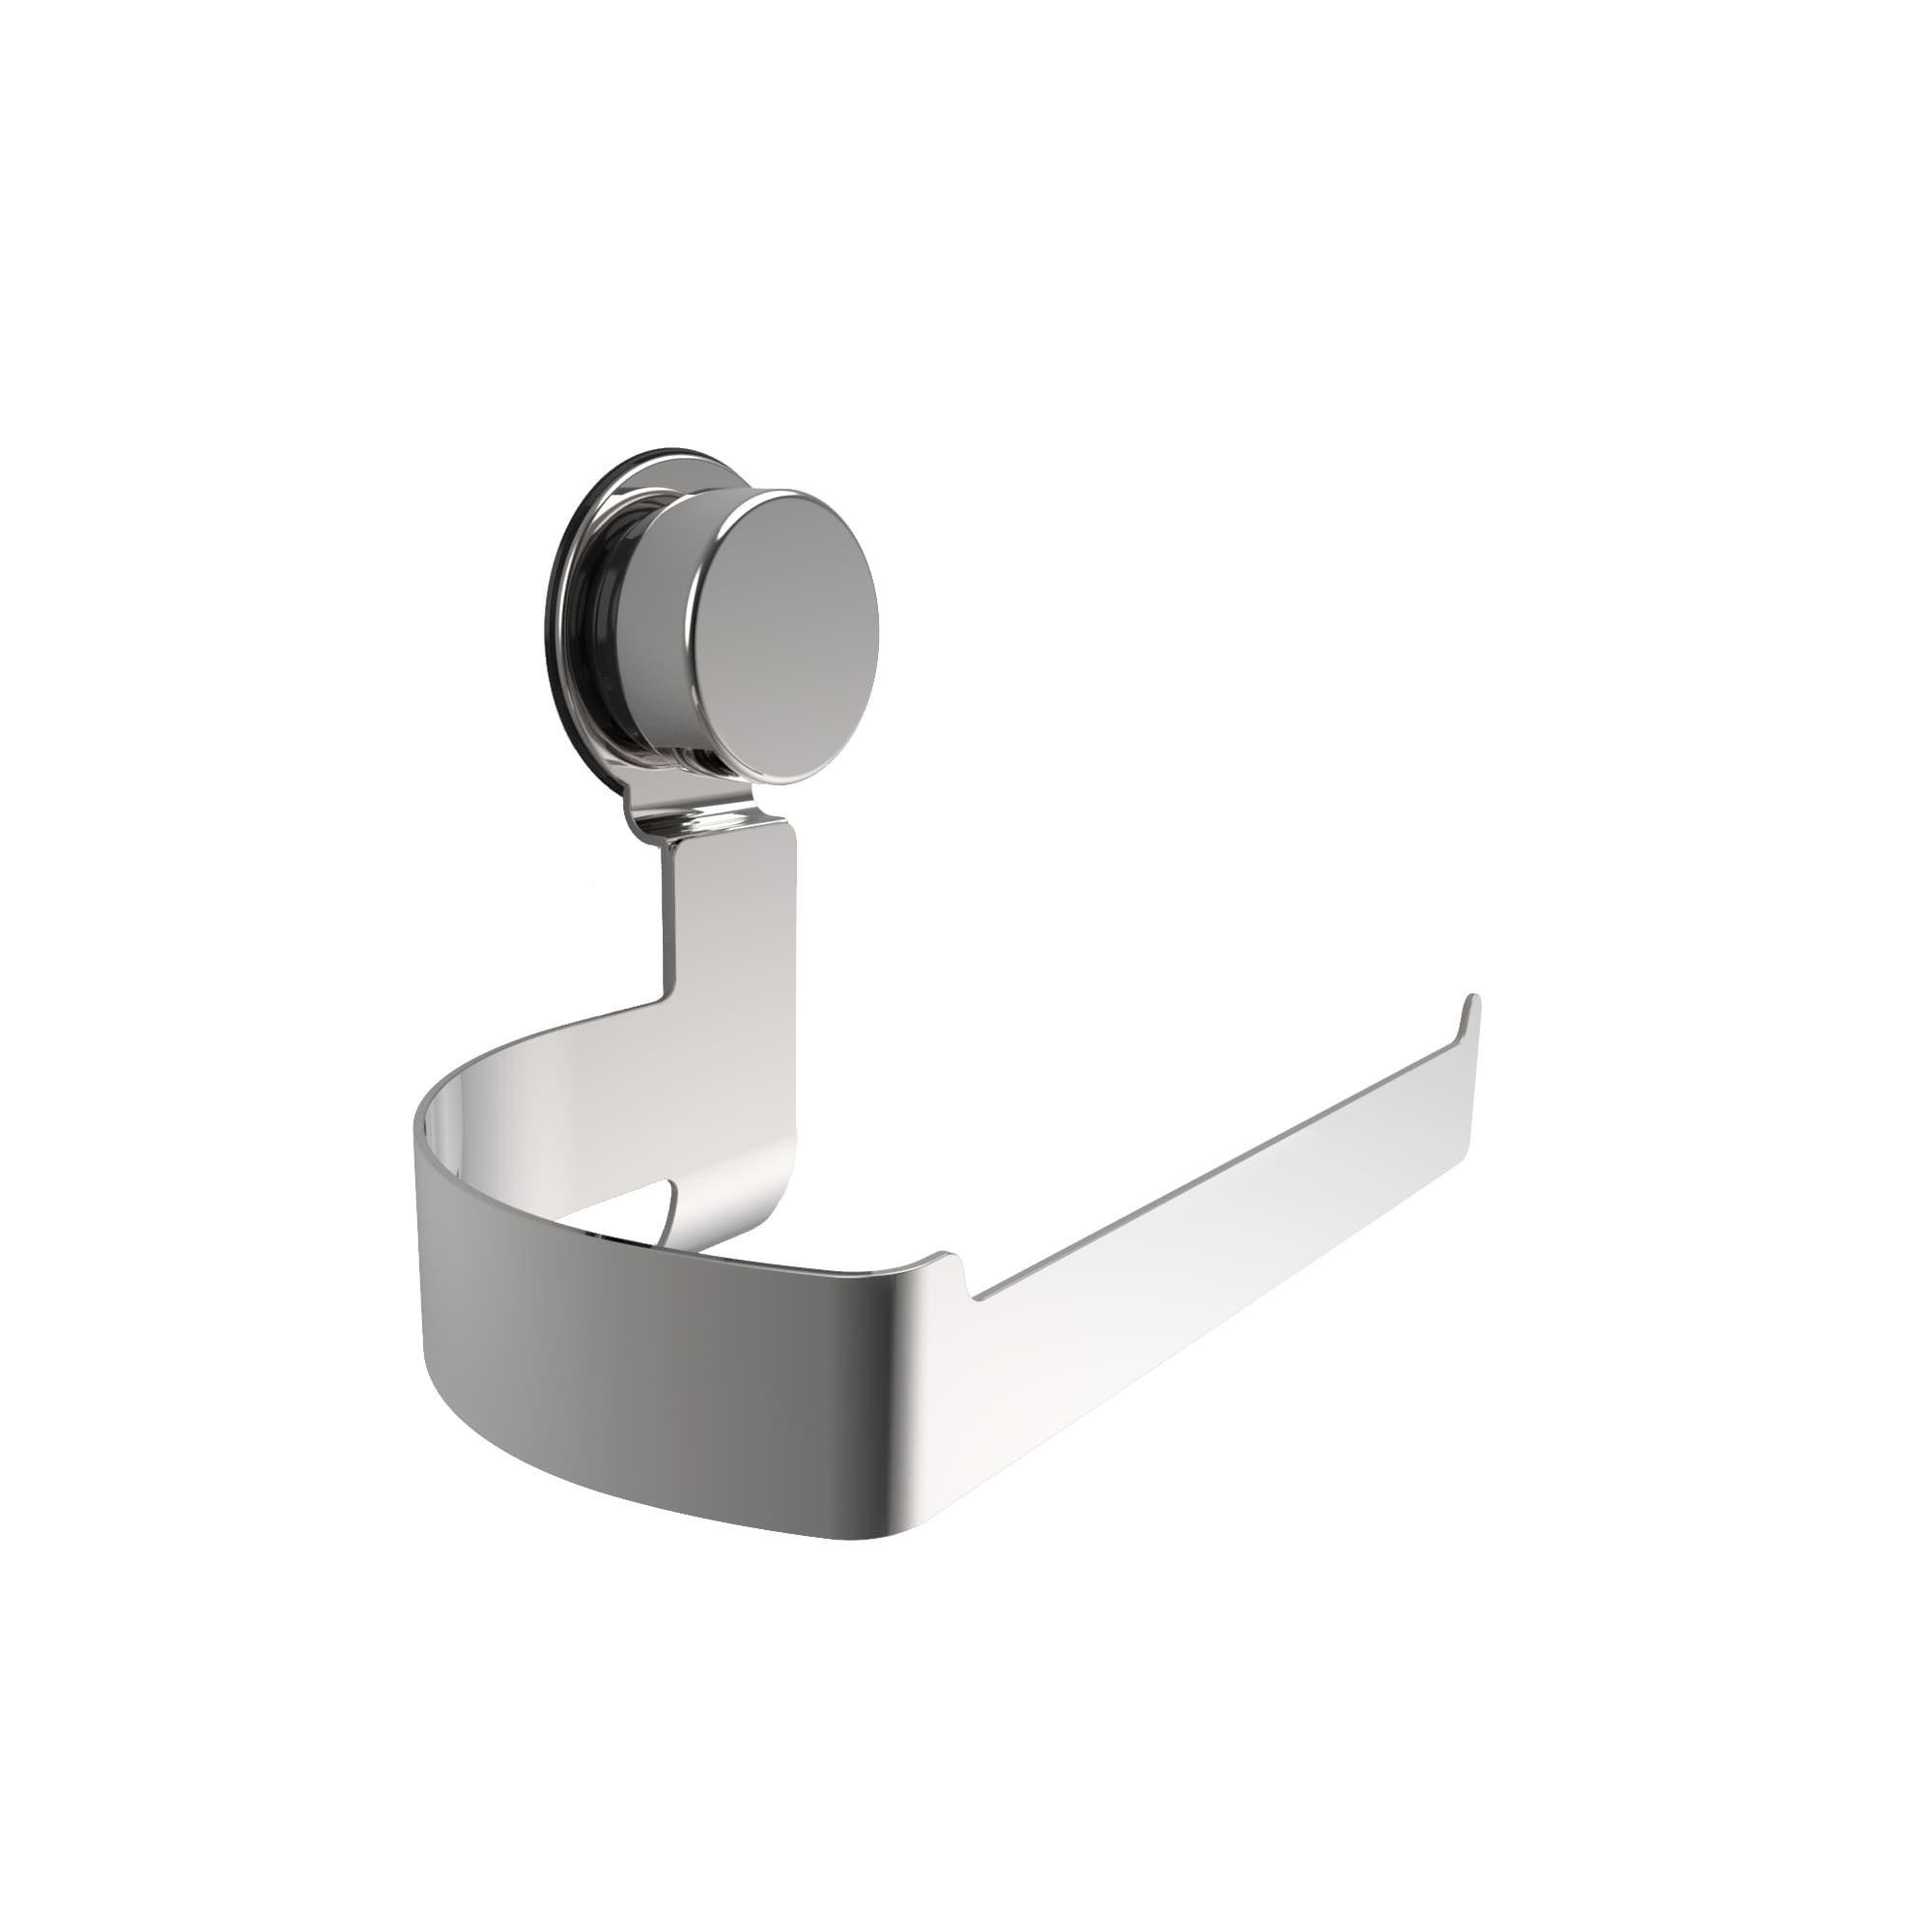 Wall Mounted Toilet Paper Roll Holder Dispenser- Twist Lock Rust ...